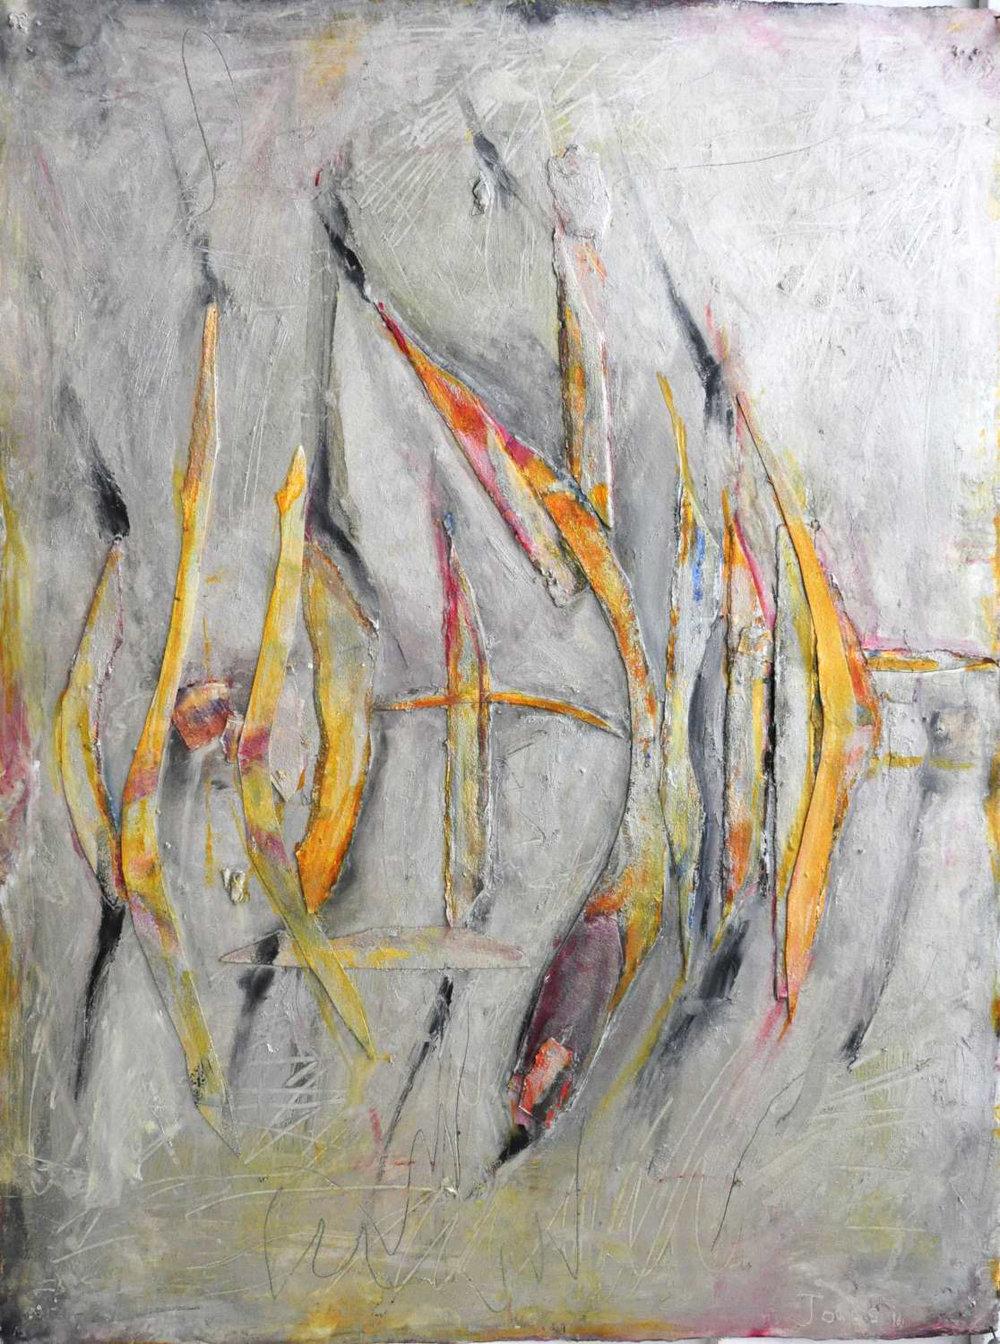 Ceres-Madelon Jones - November Grasses - 24x18 - Mixed Media on Panel - 2016 - 1500.00.jpg